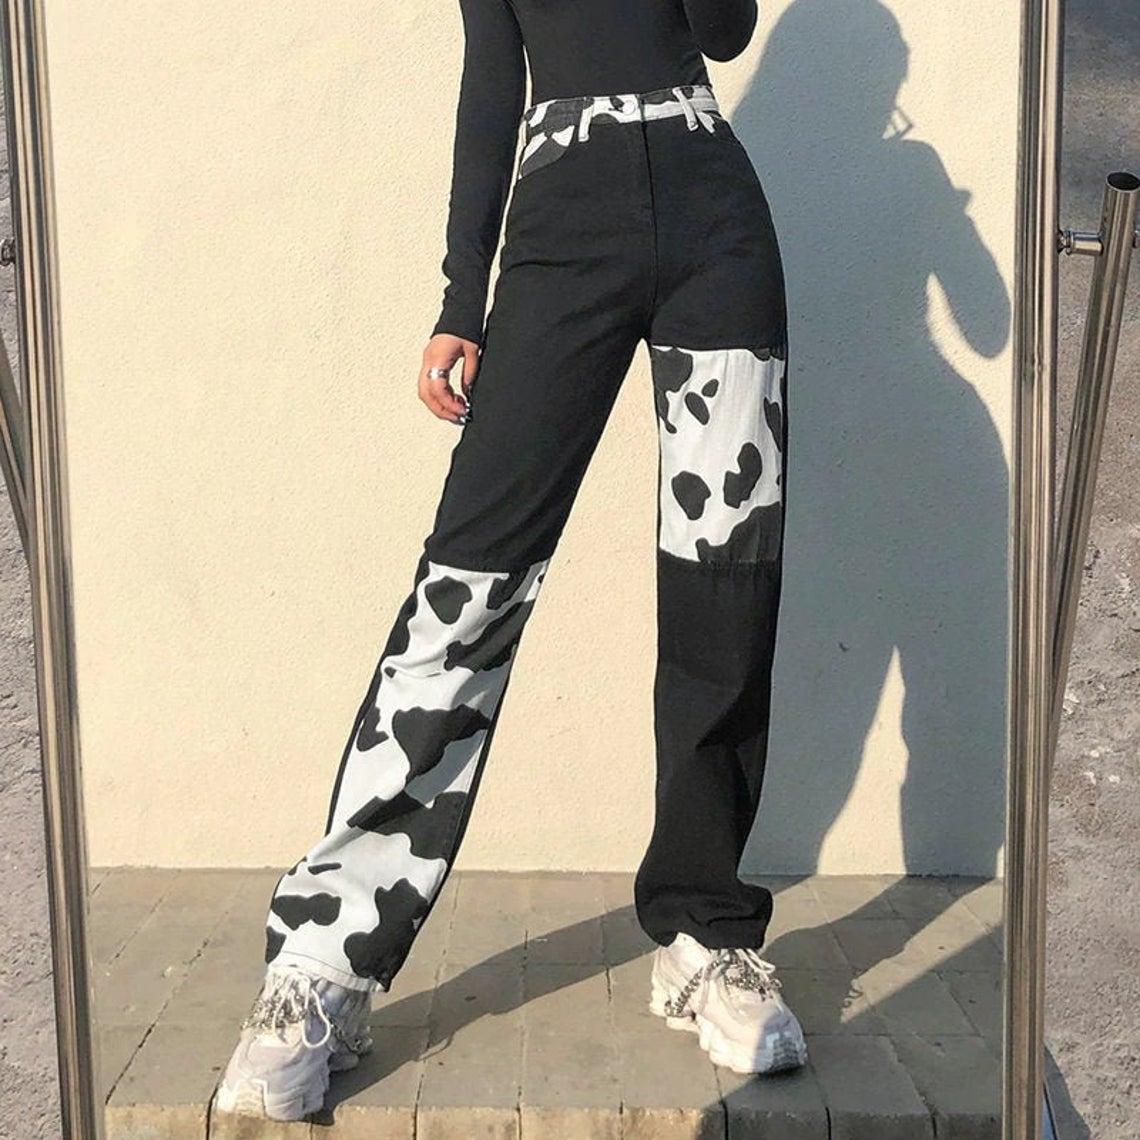 Cow Print Y2K Patchwork High Waist Jeans Straight Slim Pants Vintage Trousers Y2K Aesthetic